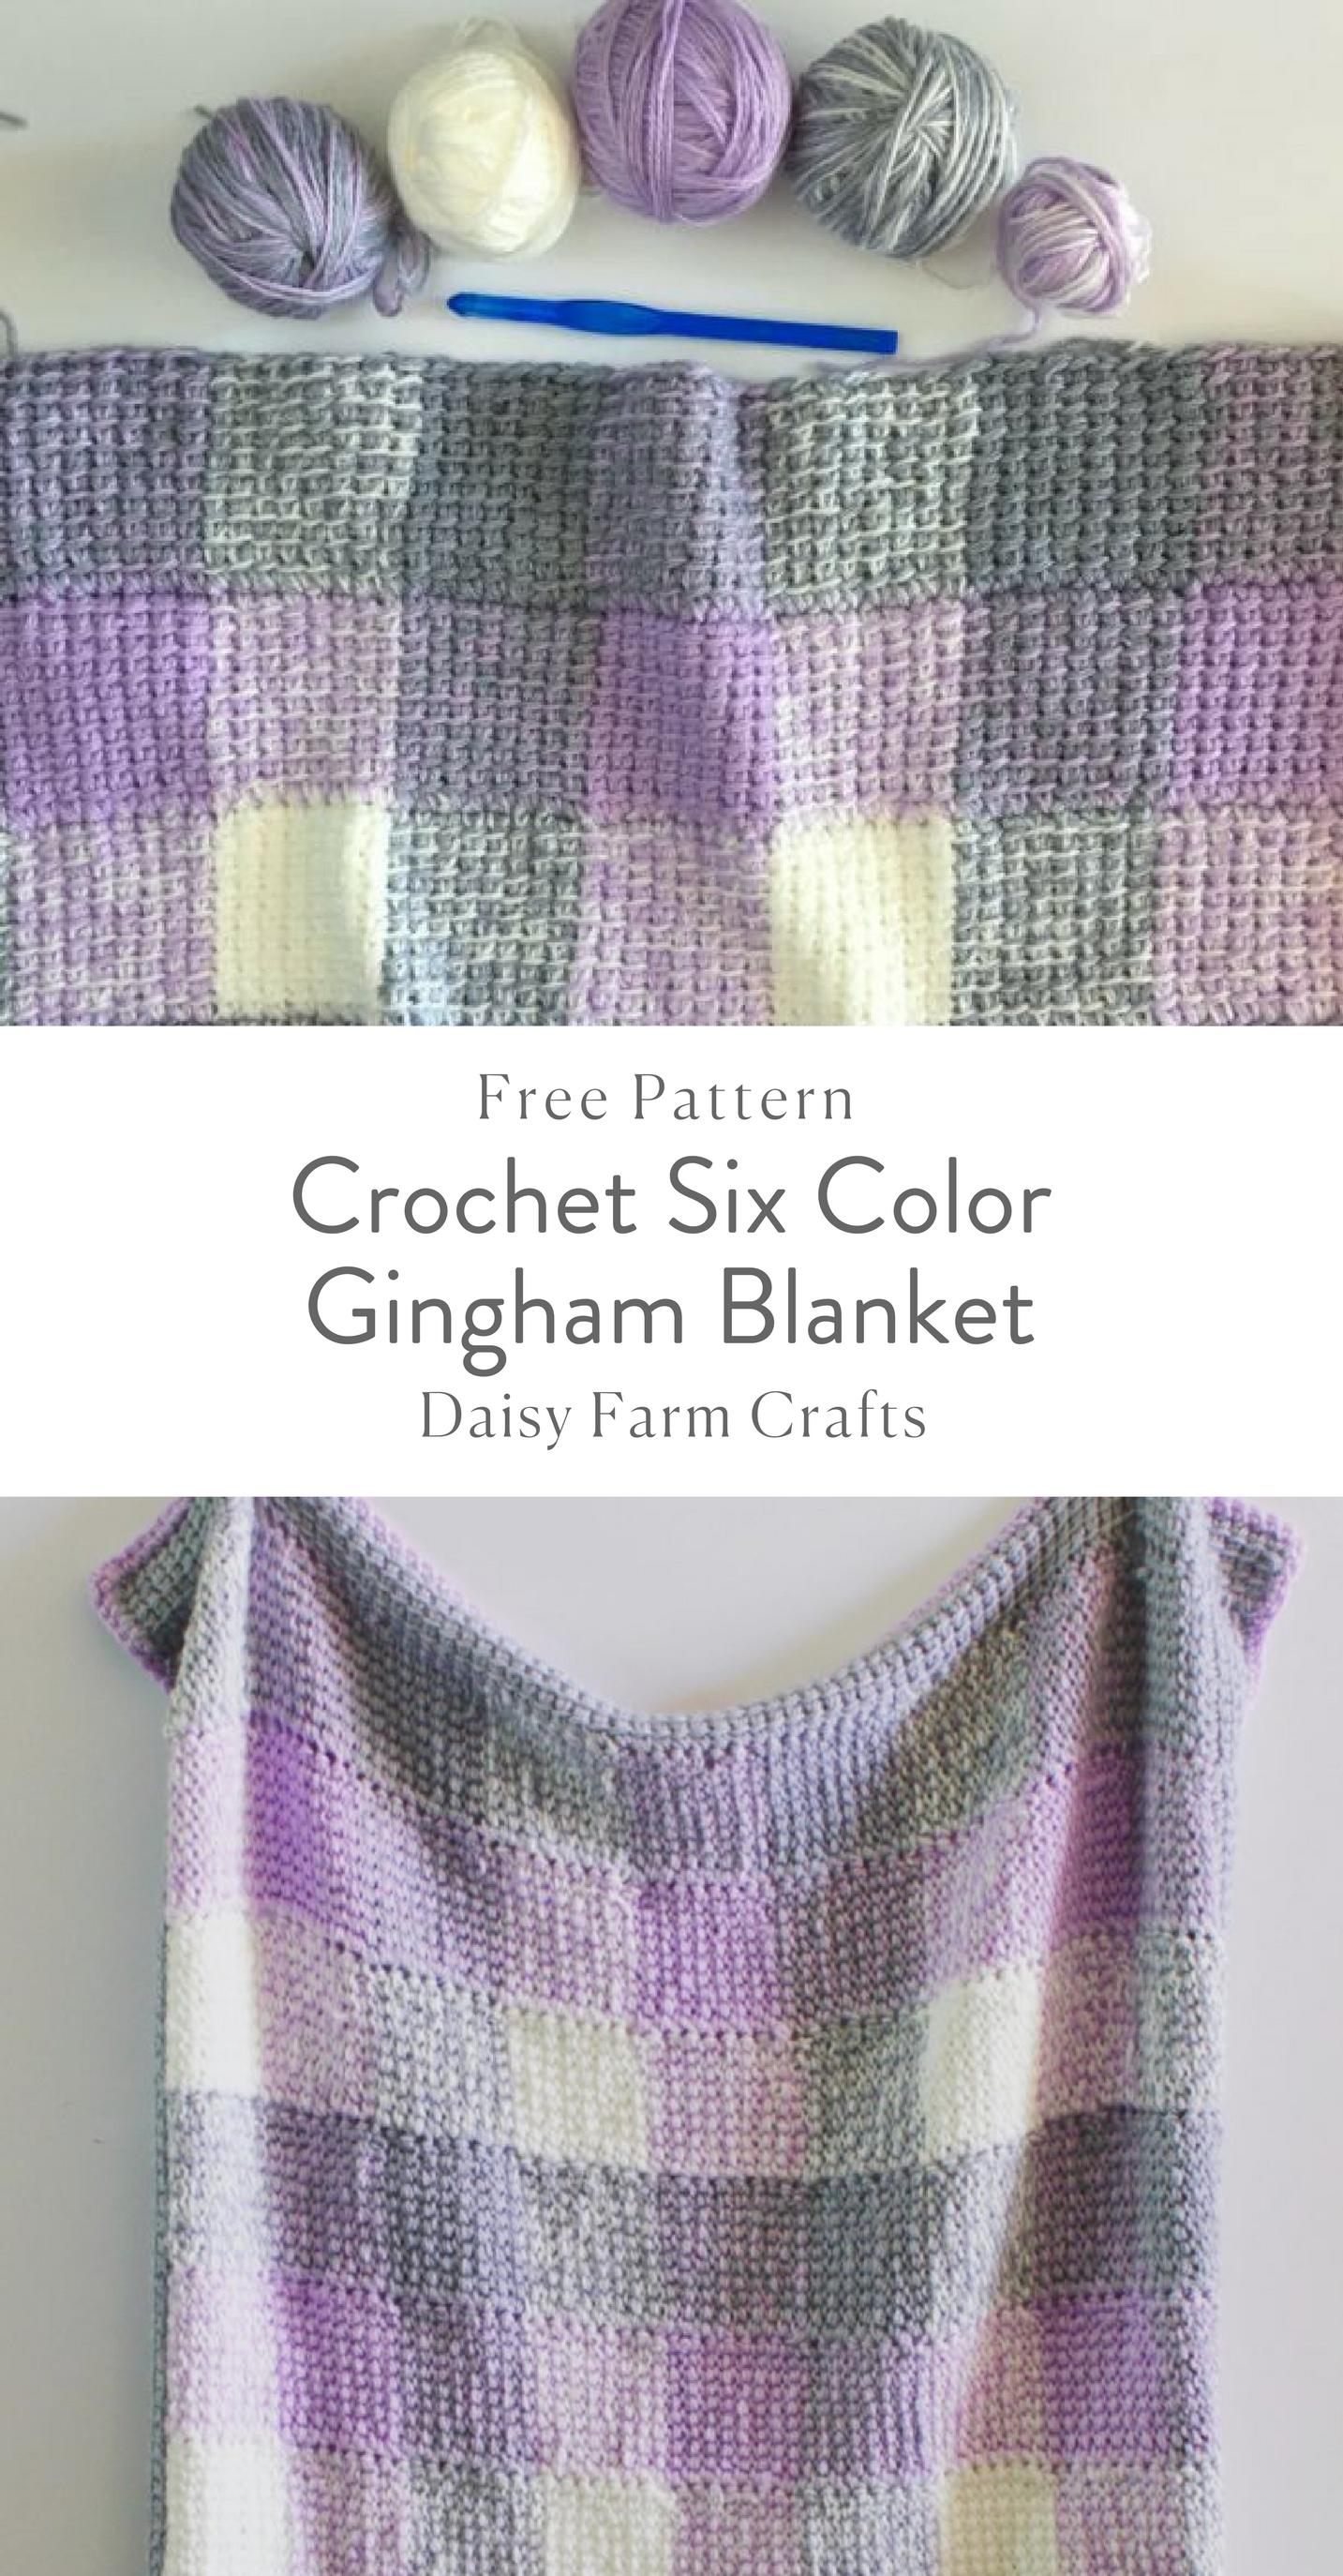 Free Pattern - Crochet Six Color Gingham Blanket | Crochet blankets ...